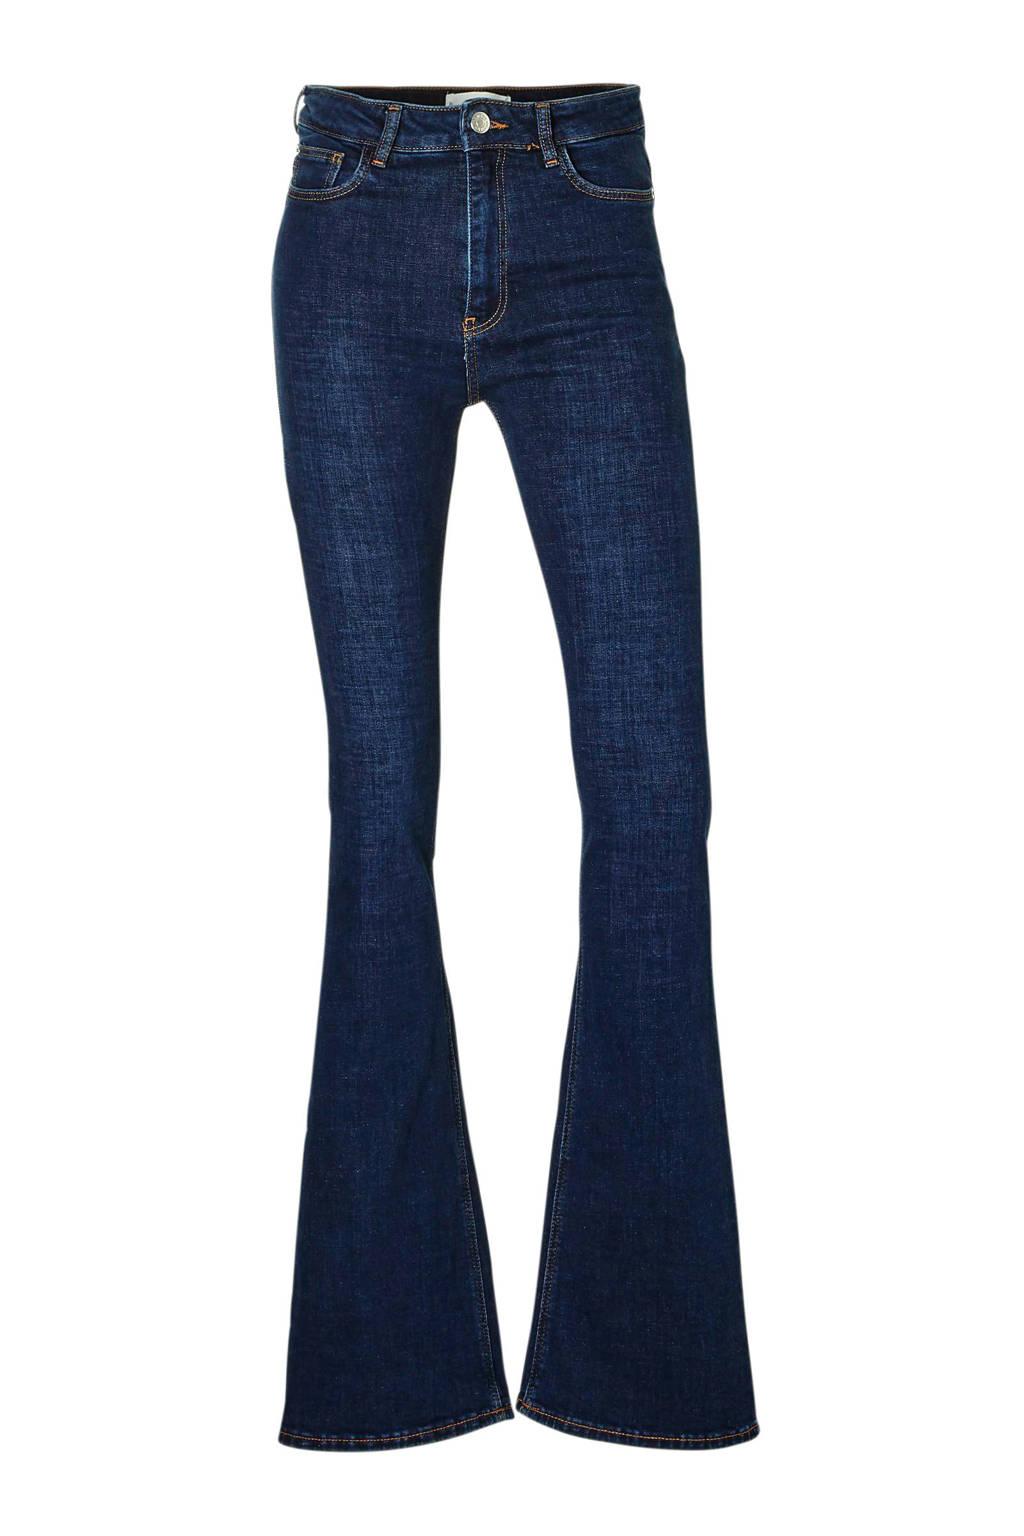 Mango high waisted flared jeans, Dark denim